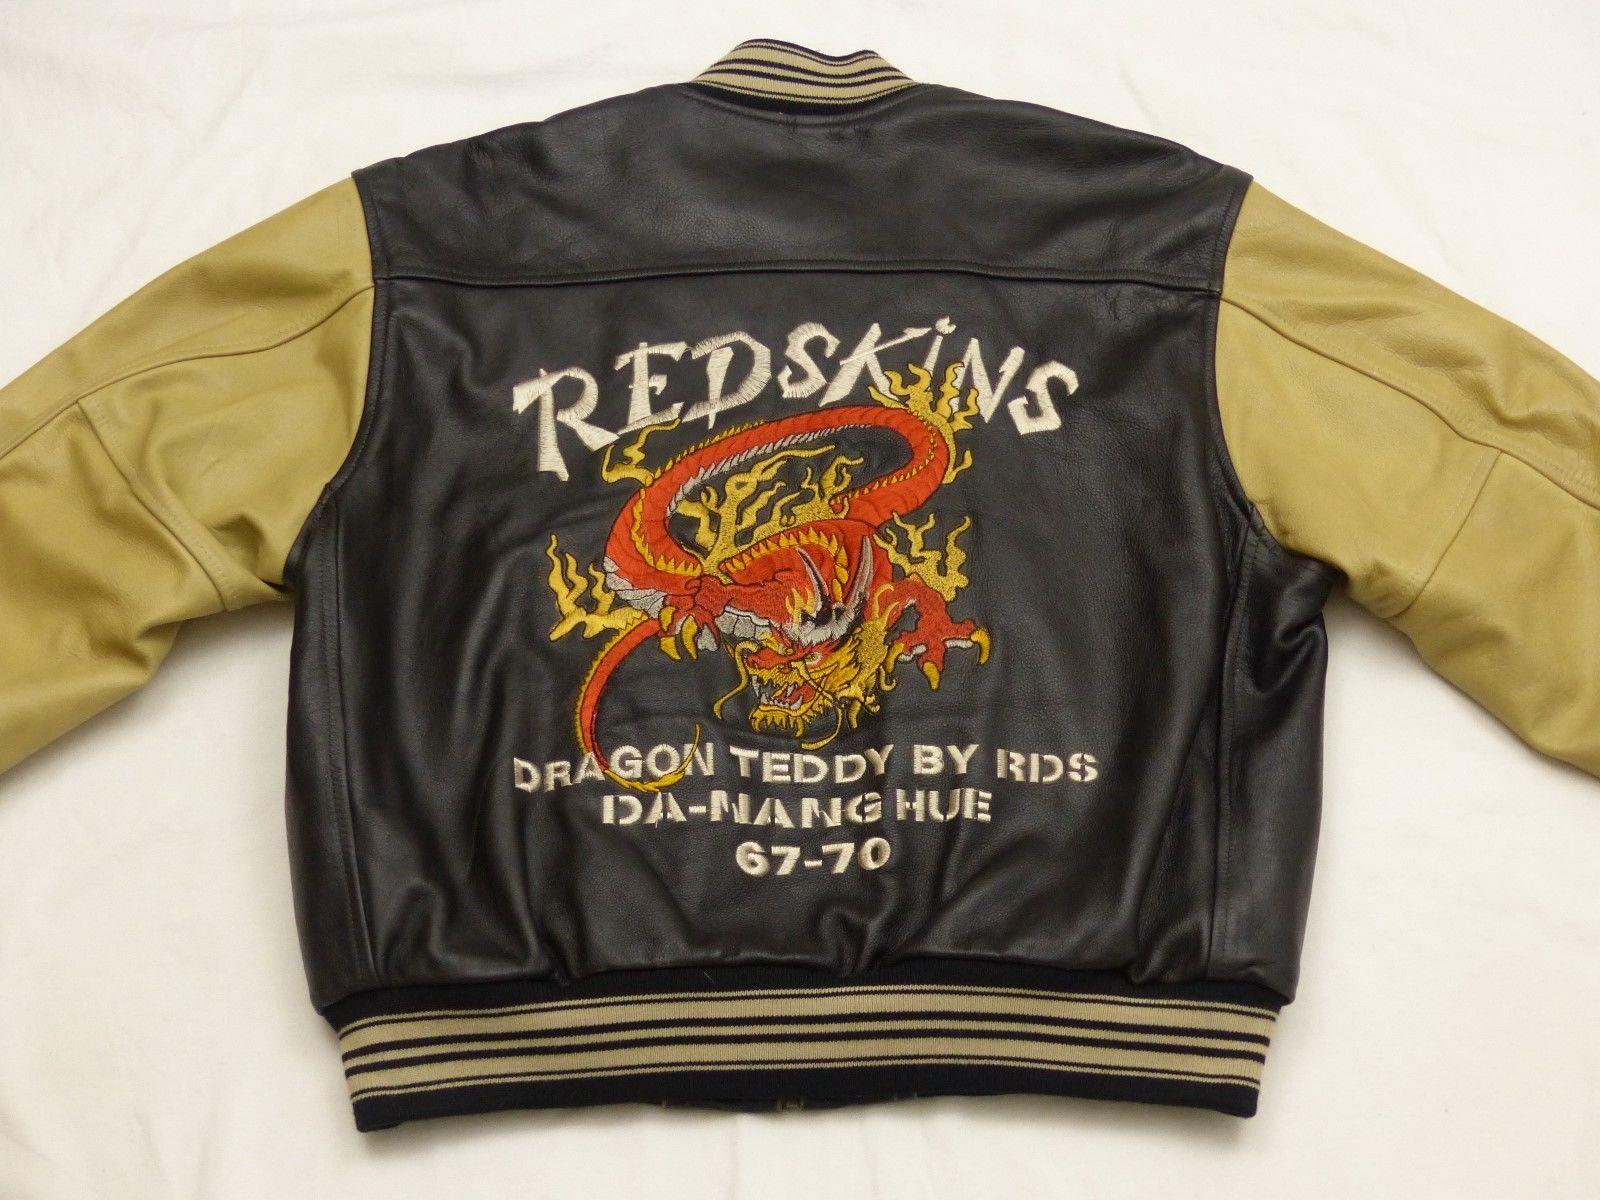 Buy Redskins leather jacket KLN Teddy hang hue XL leather jacket for pilot motorcycle jacket for men